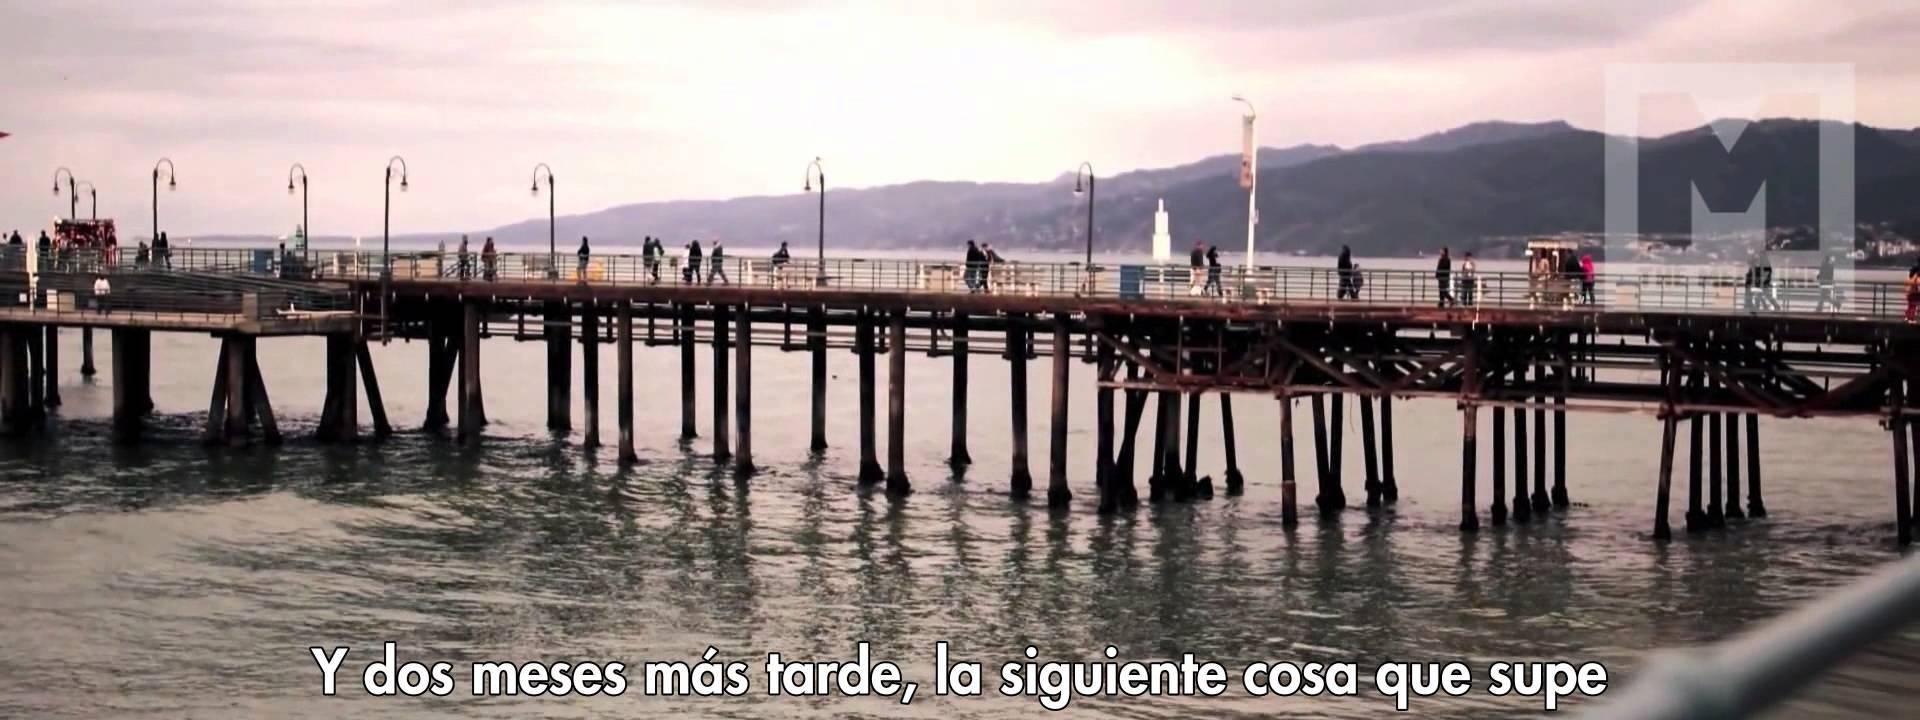 T.I. Ft B.o.B, Kendrick Lamar & Kris Stephen – Memories Back Then  (Subtítulos Español)